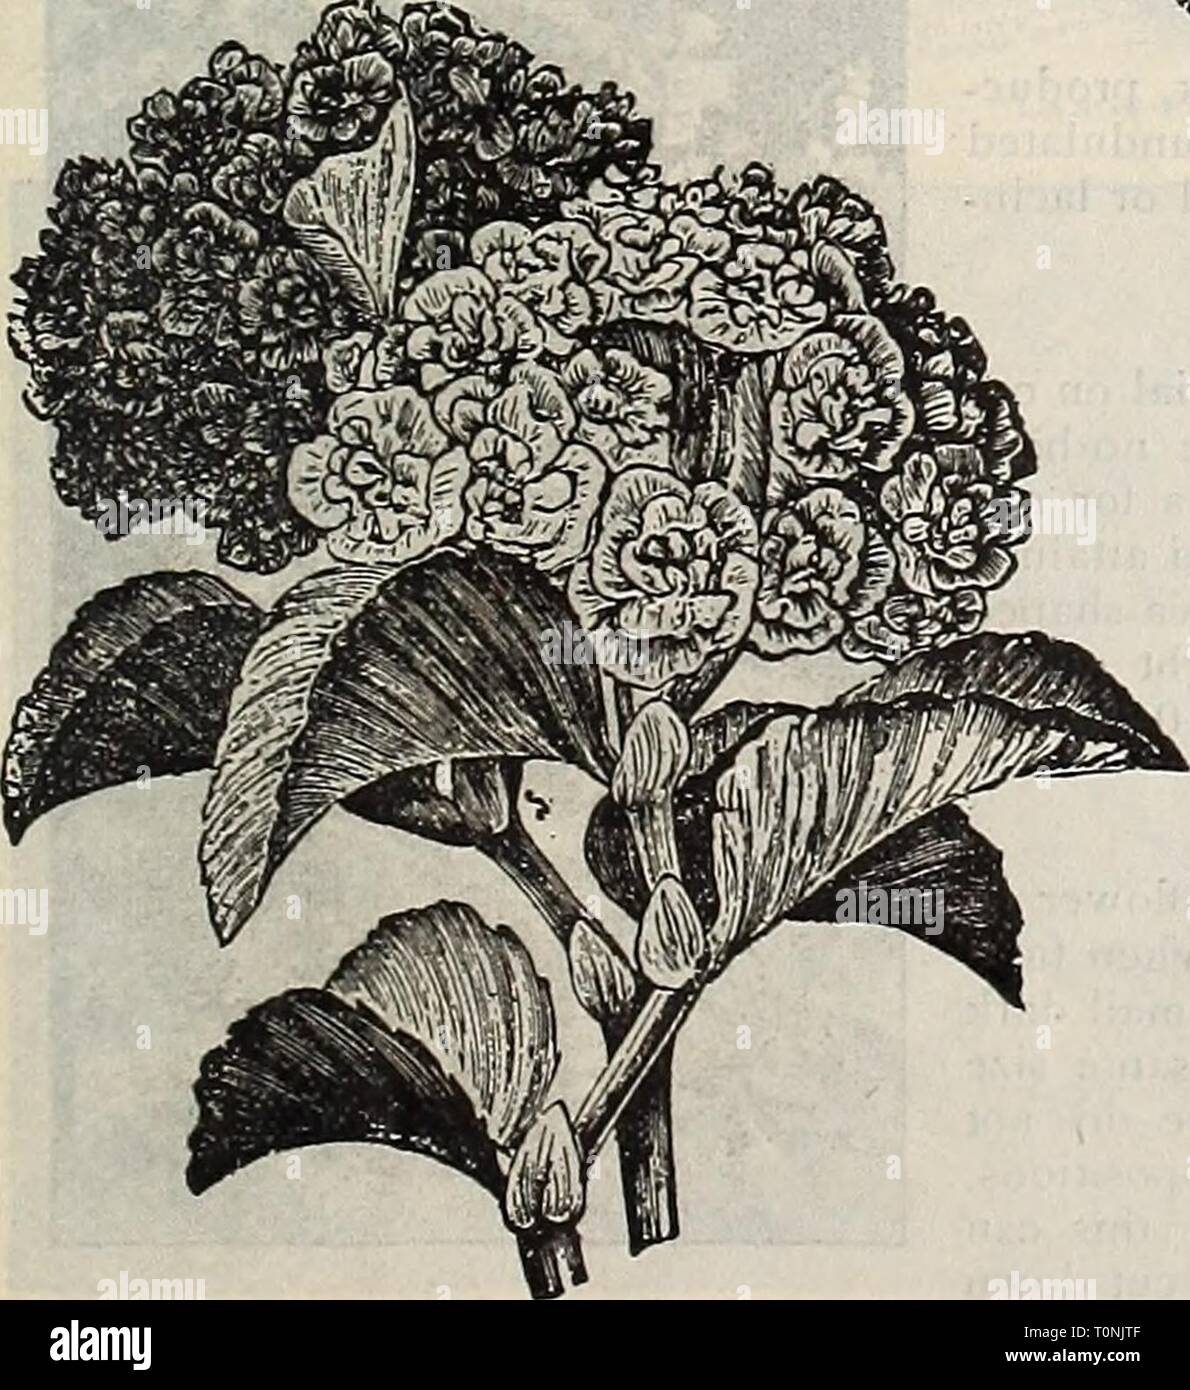 15 X Nelke Hardy Rand Gemischte Groß Jungpflanzen Krautige Bereit Zum Pflanze